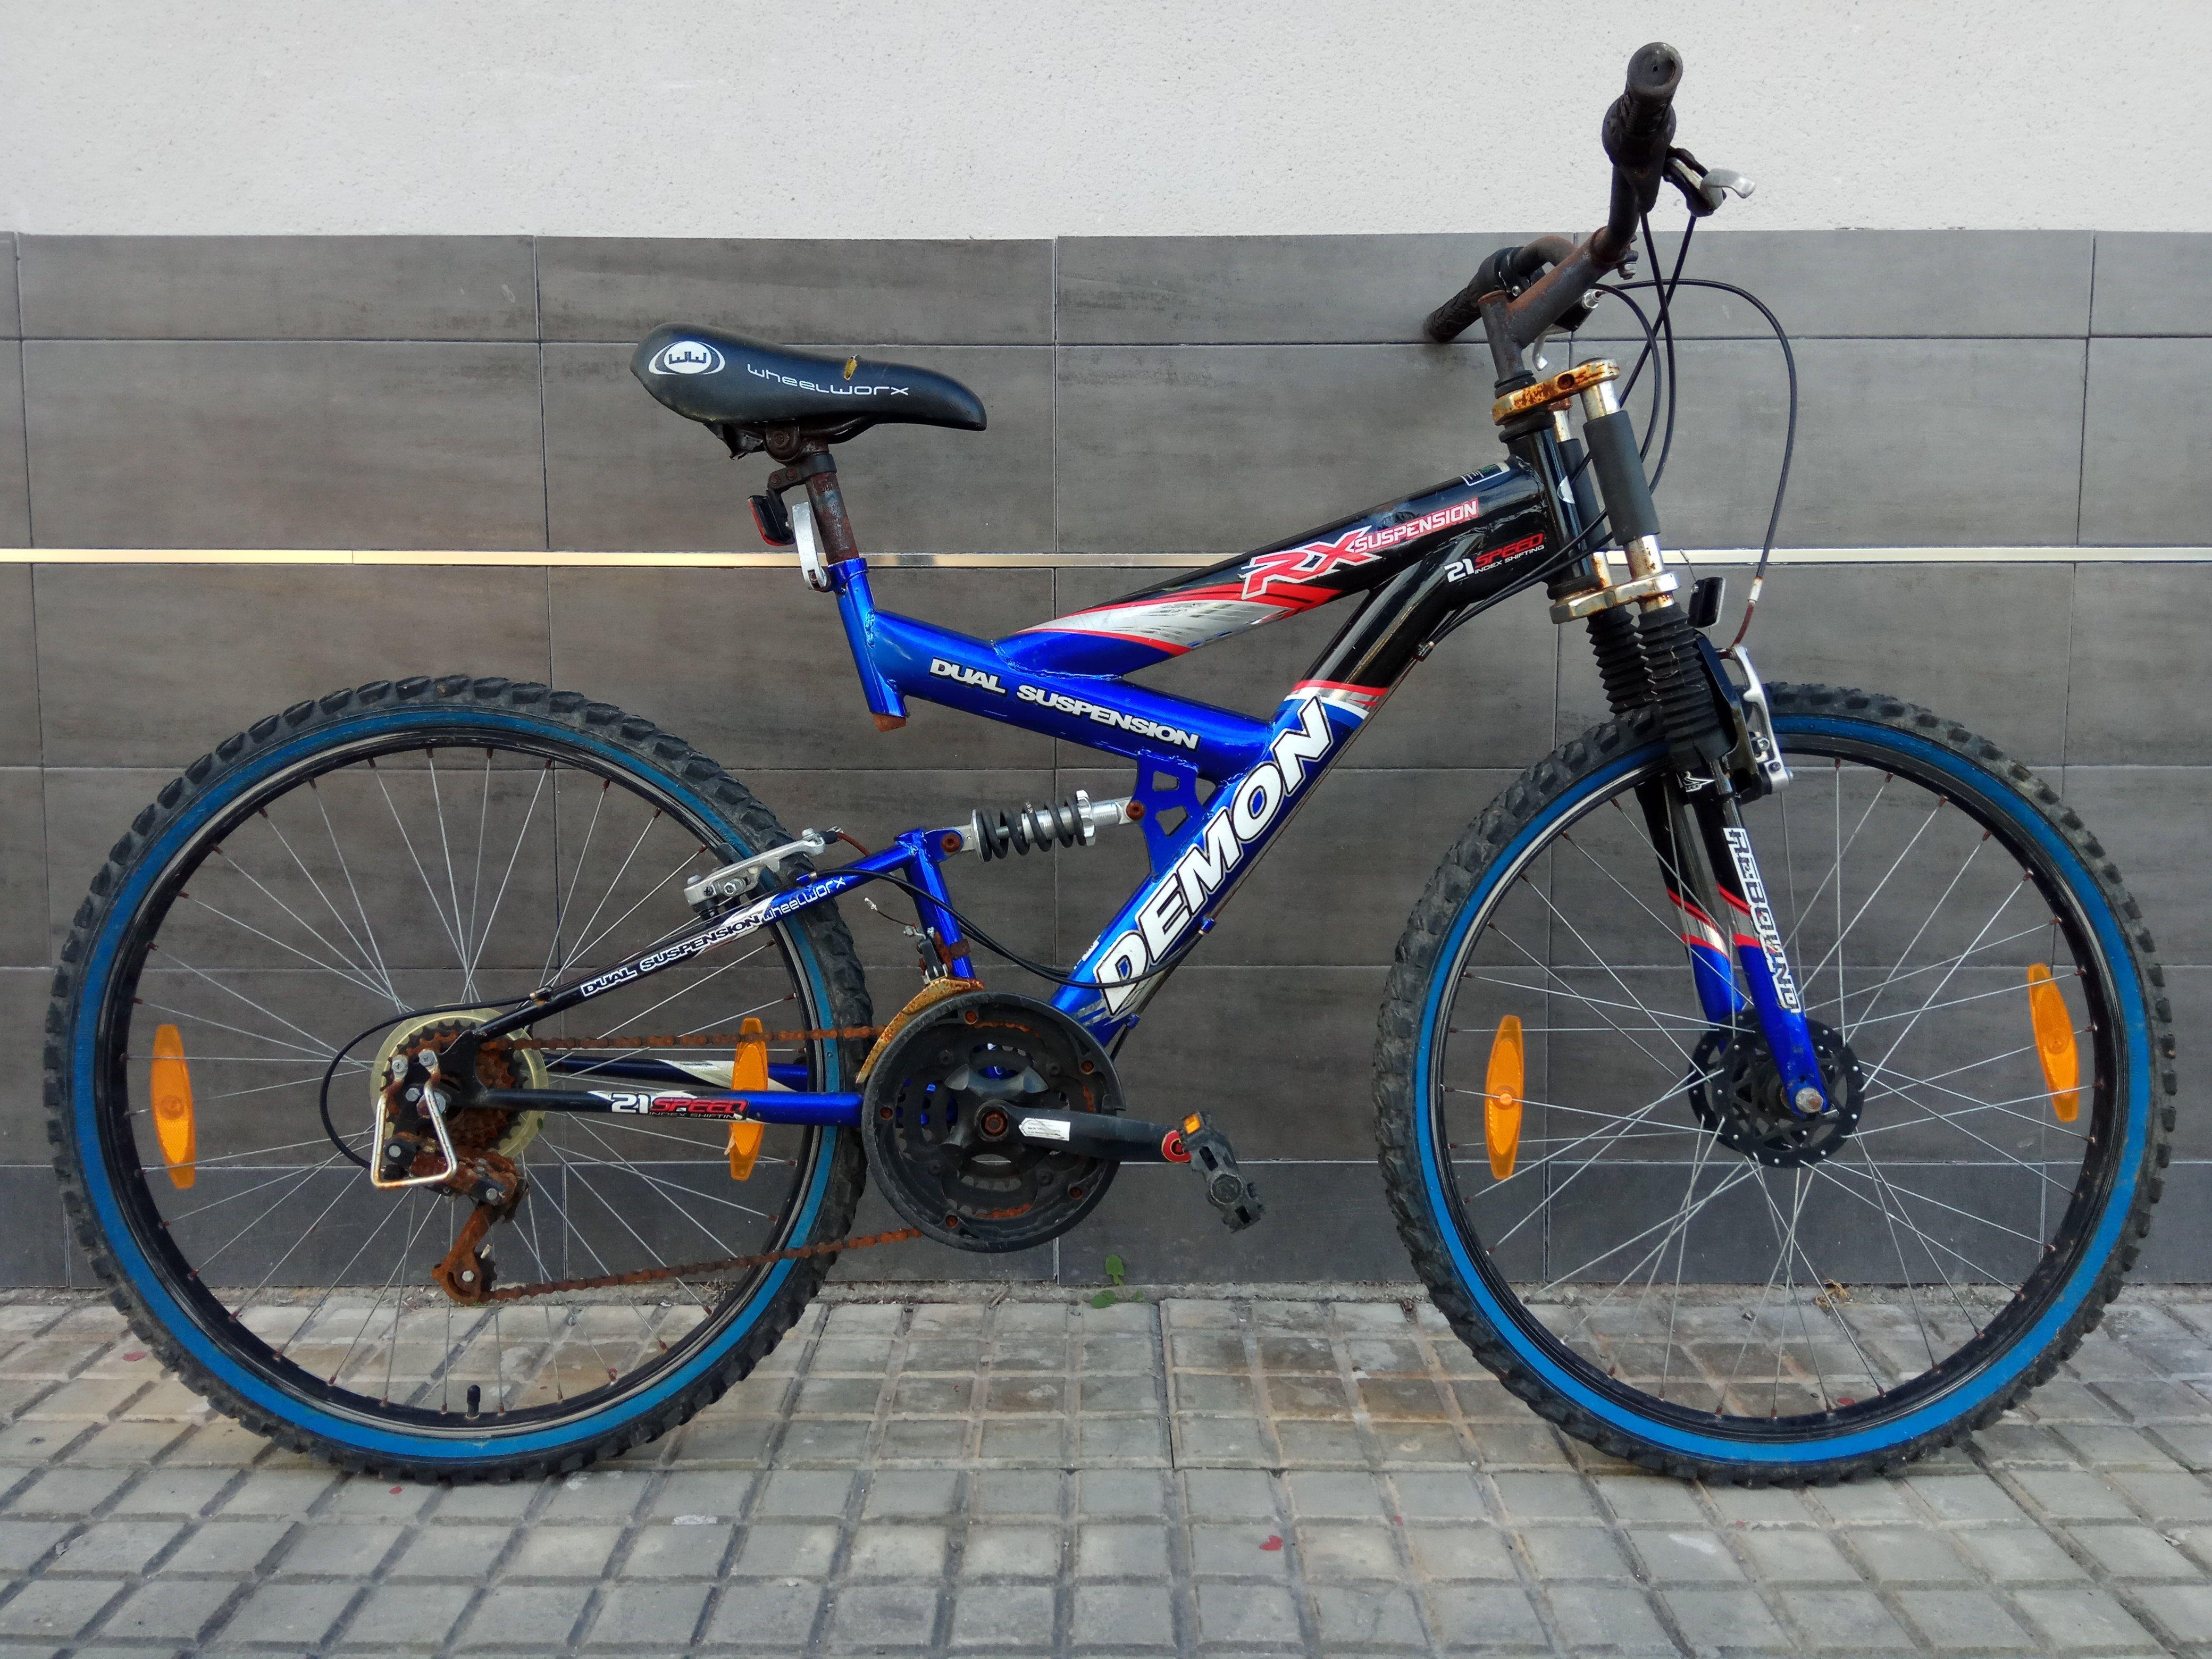 Bici Wheelworx para Restaurar 60€ MARCA: Wheelworx MODELO: Demon ...